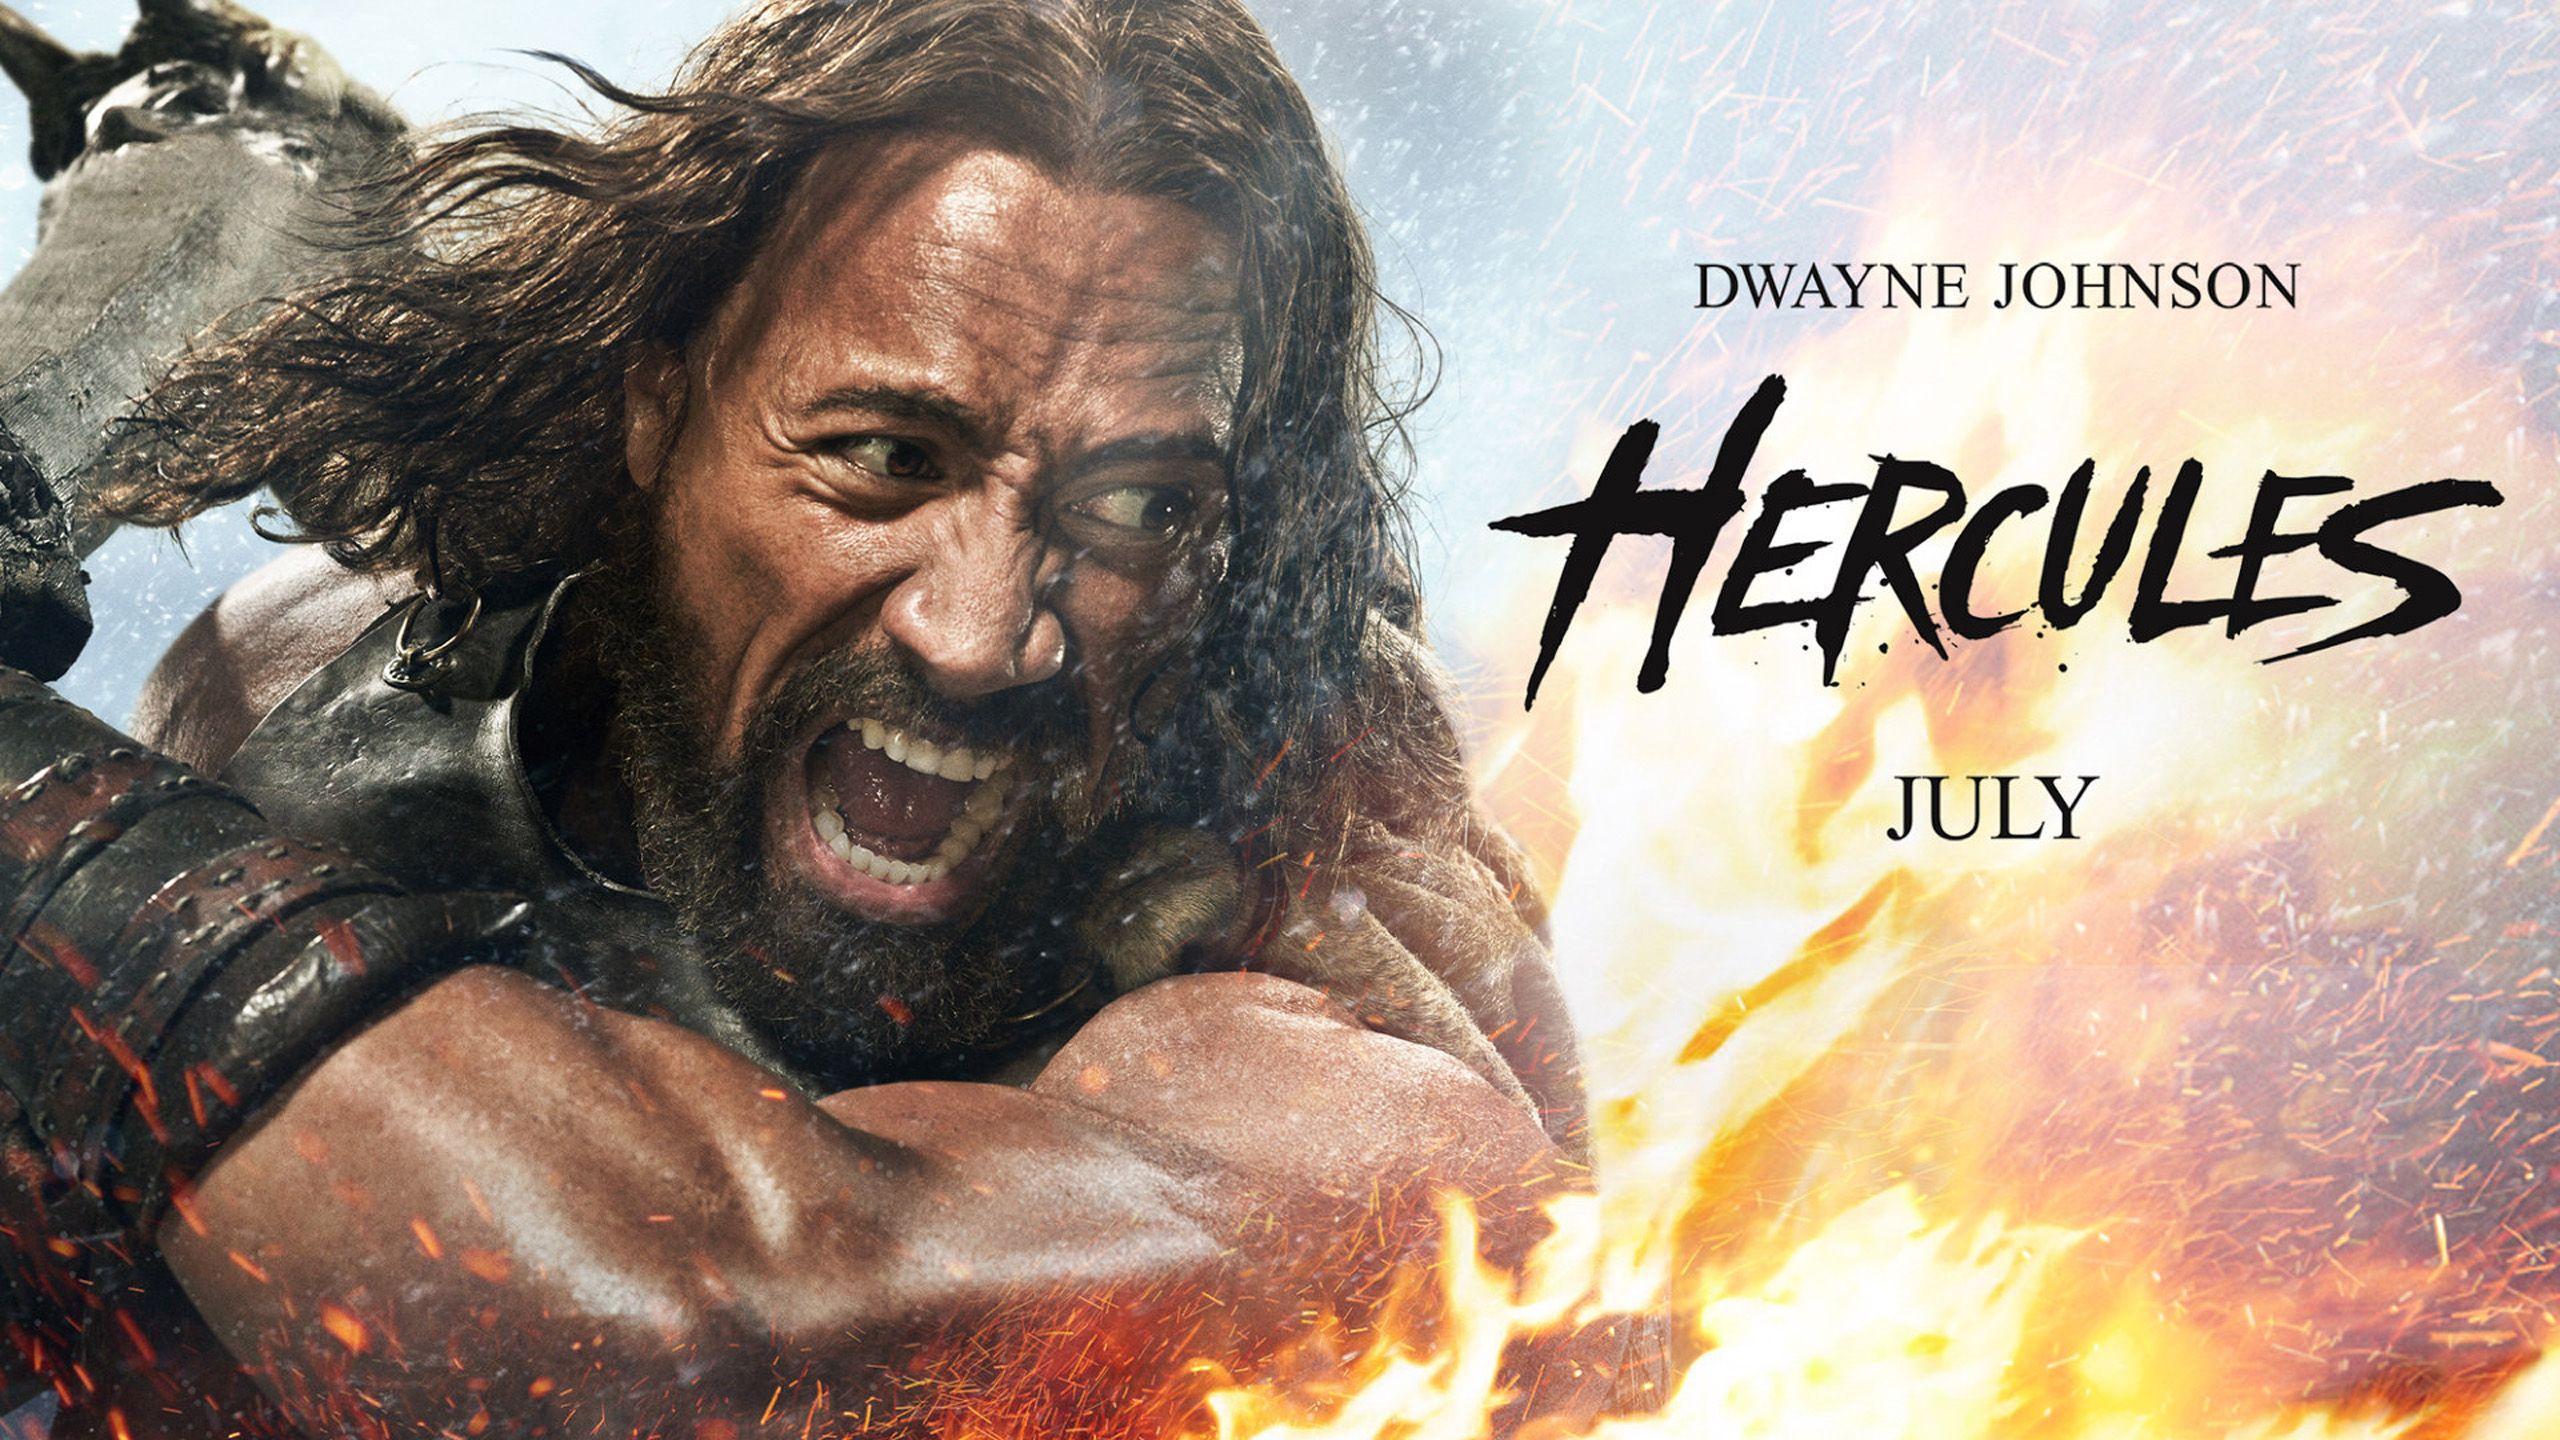 Hercules Wallpapers, HD Wallpaper Downloads